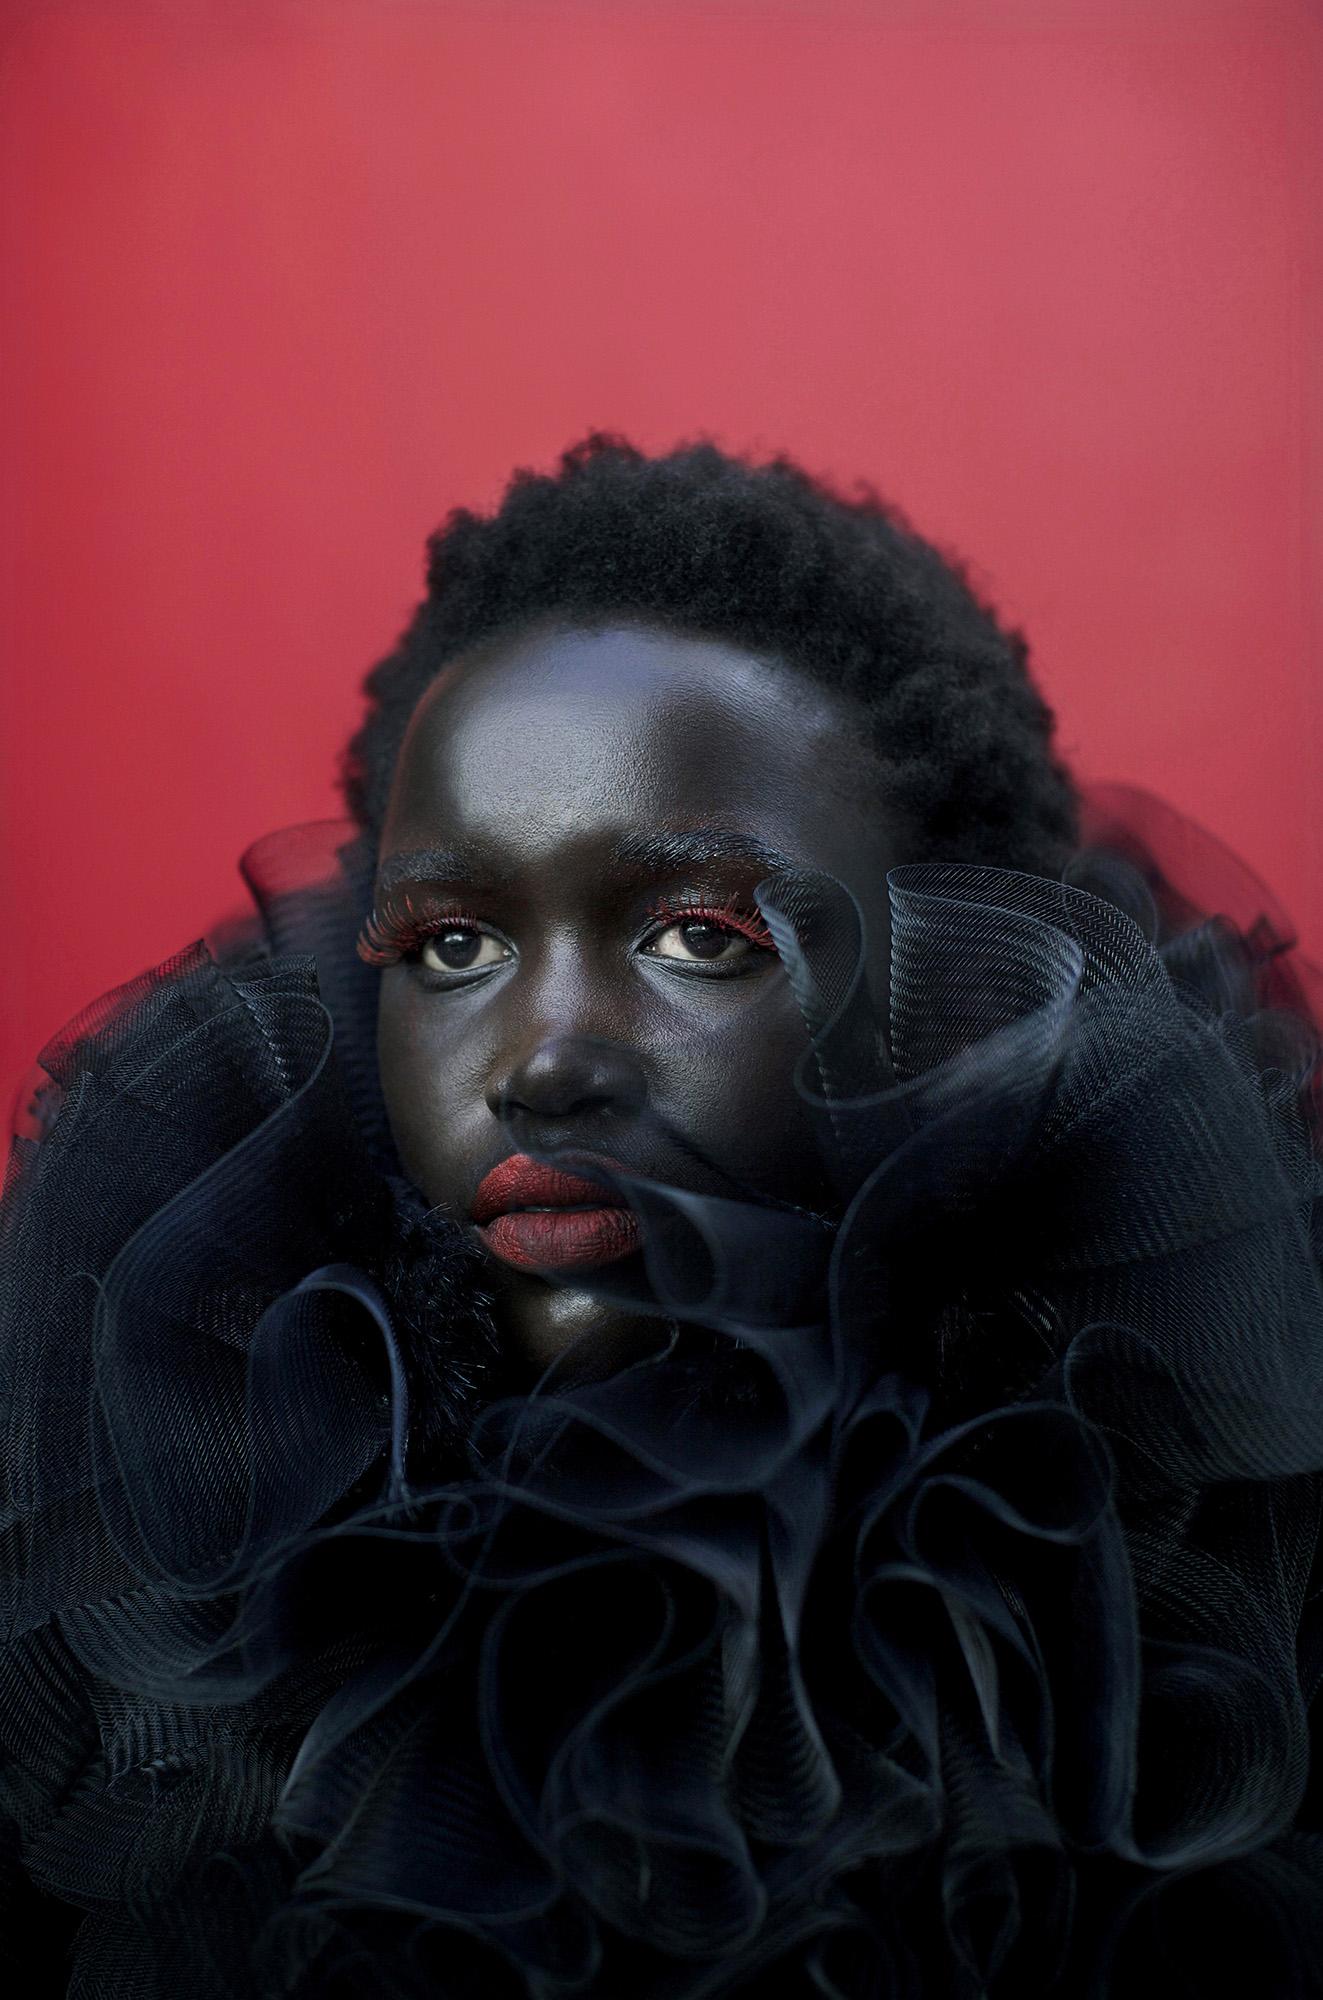 © Per-Anders Pettersson  Titel: Ur serien African Catwalk Plats/Datum: Cape Town Fashion Week, SA 2011   Bildmått 60x90 cm/Pappersmått 70x100 cm  Teknik: Arkivbeständig pigmentbläck utskrift Upplaga: 7+2 AP   (#4/7)  Signerad: Ja  Pris: SEK 19 500  (avser oinramad bild)